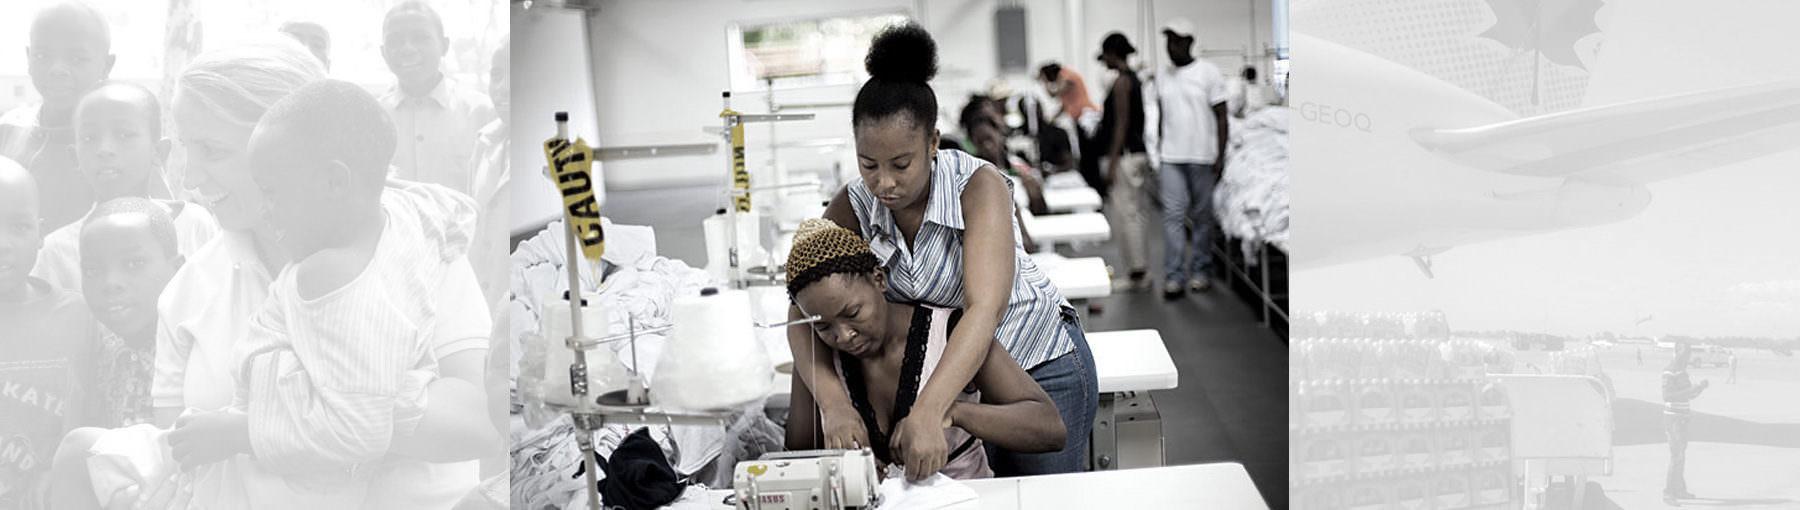 haiti-factory-1800x510.jpg